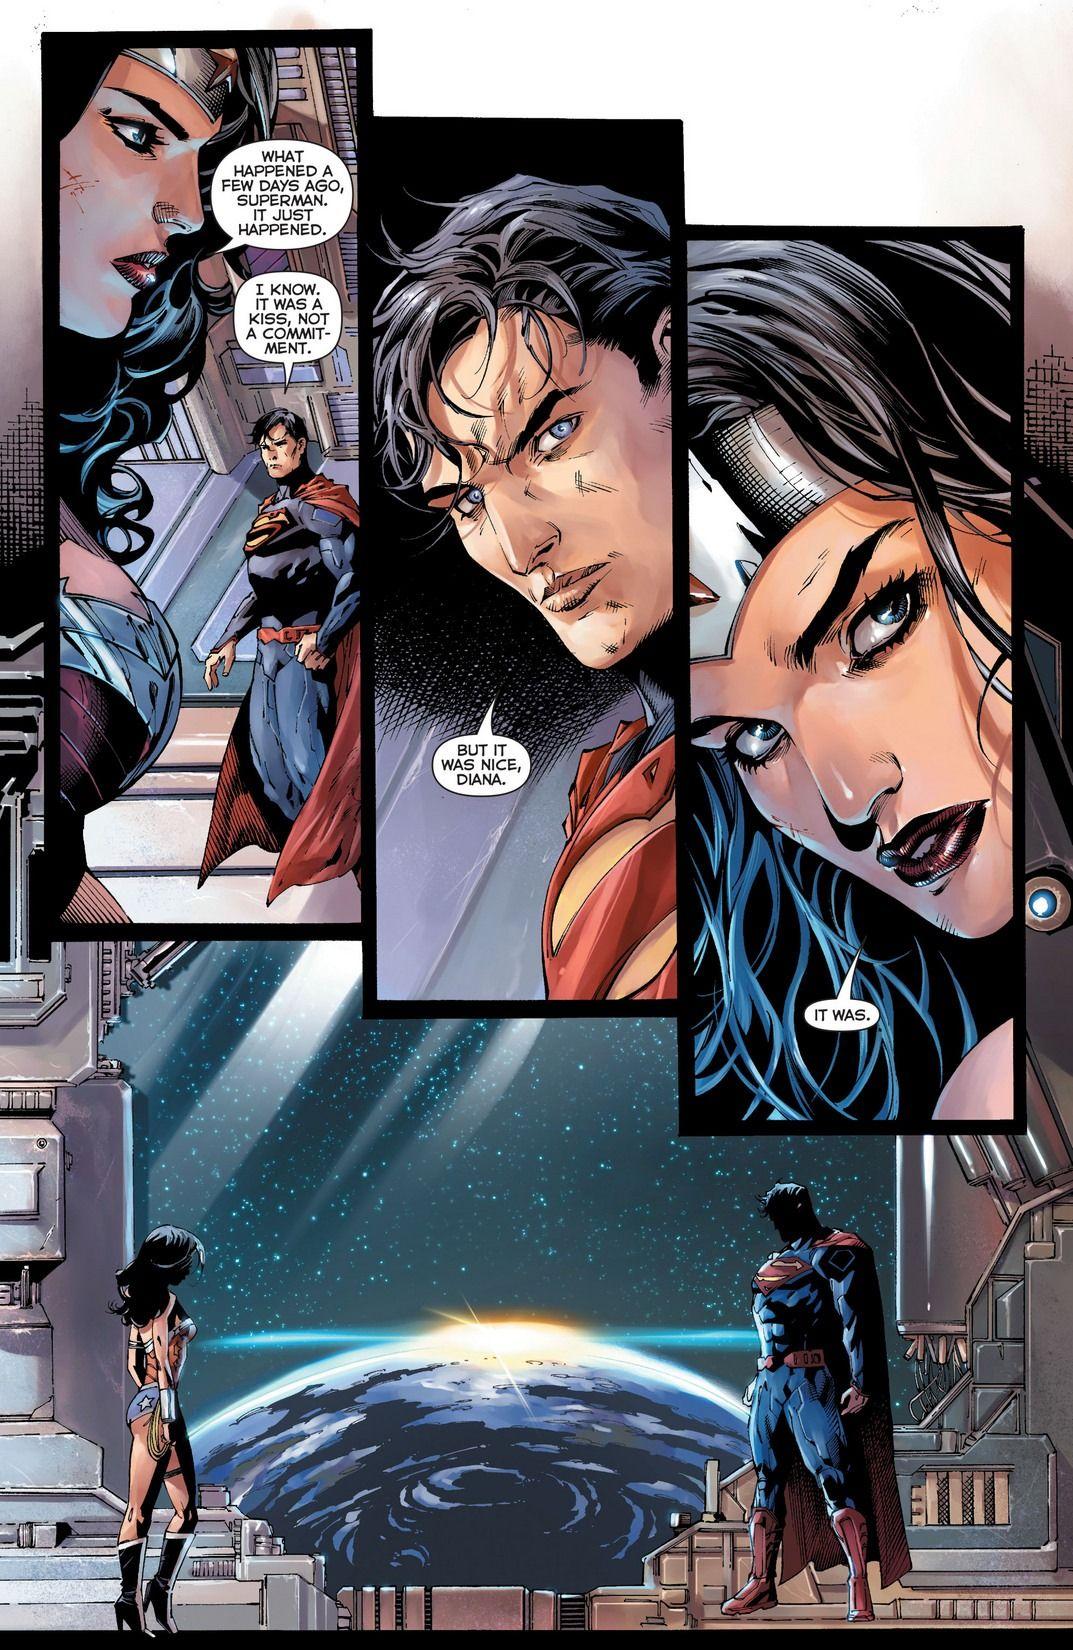 Relationship wonder woman superman Superman &